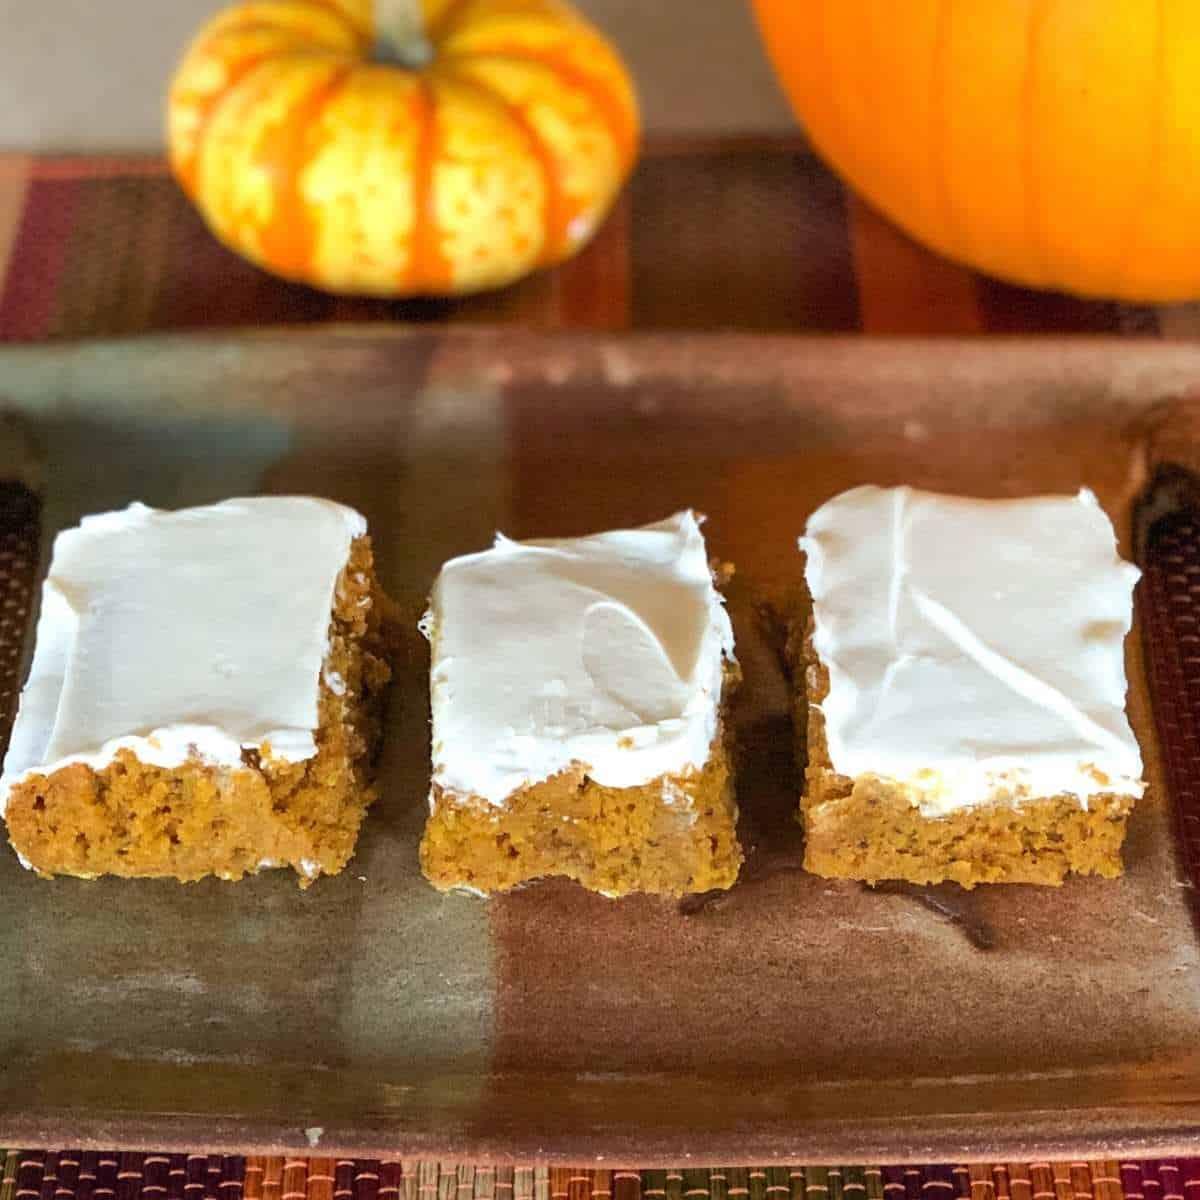 A row of pumpkin bars on a plate